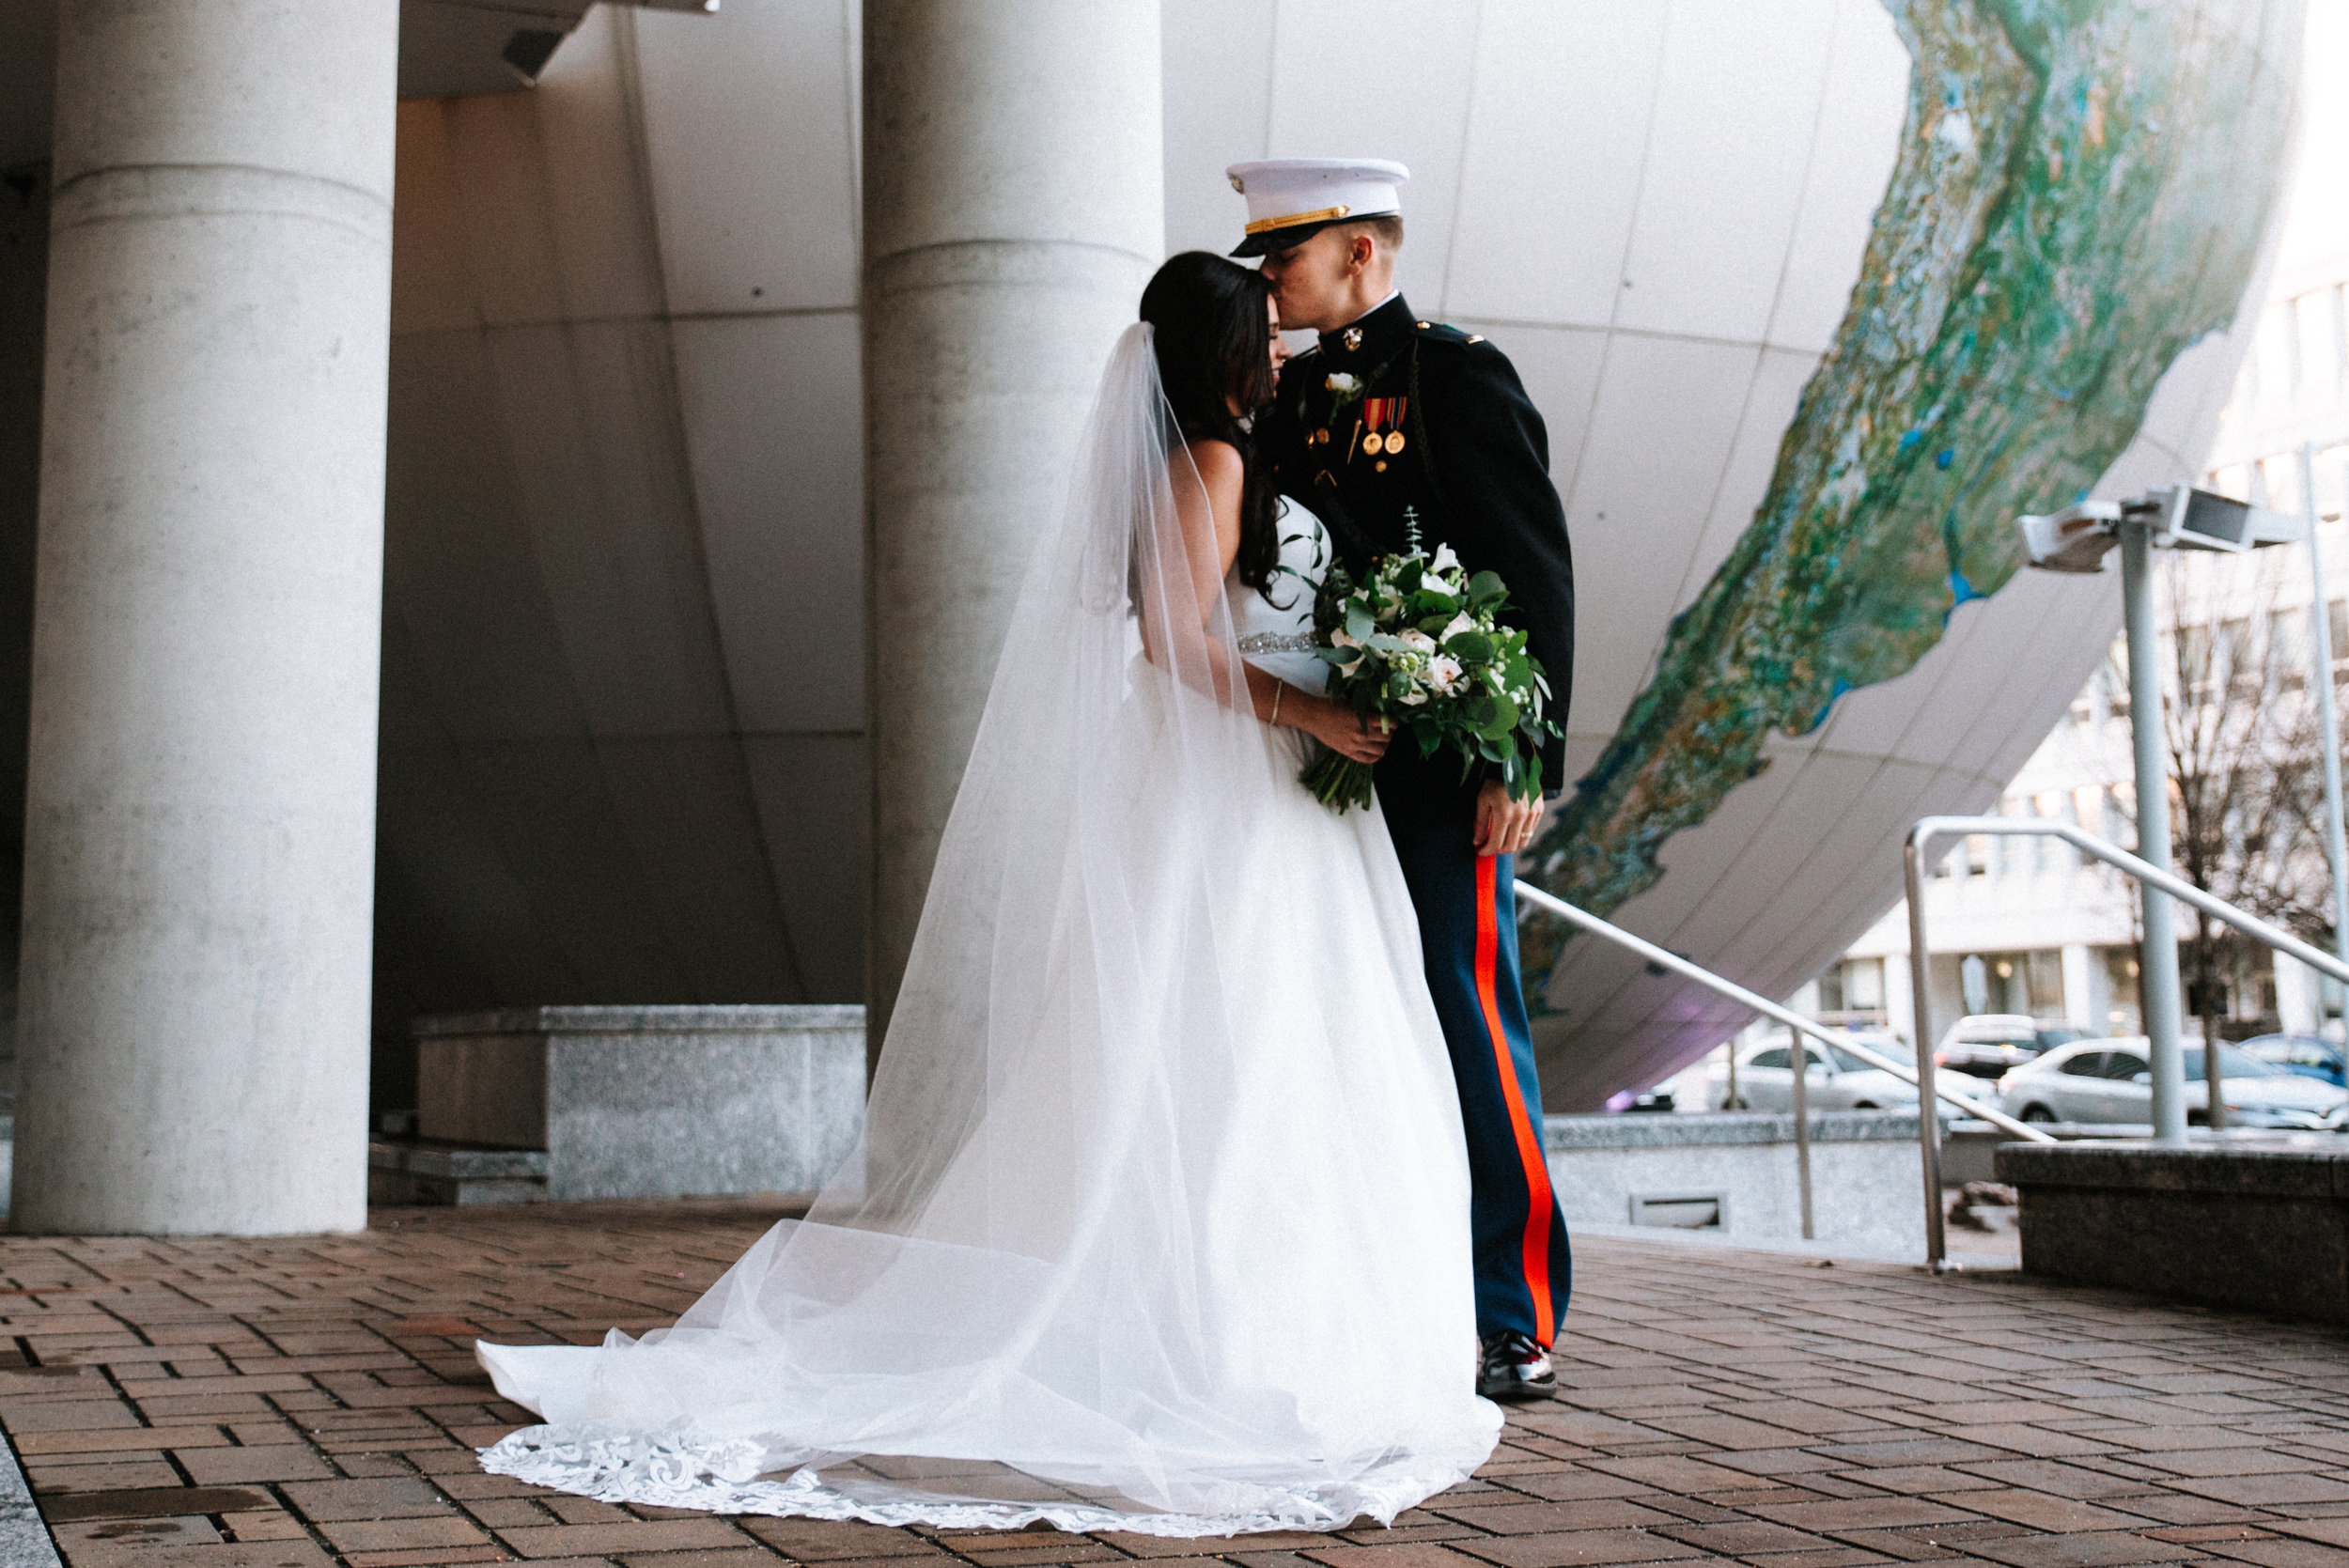 +Raleigh Wedding +North Carolina +Photographer +Wedding Photographer +Engagement Photographer +All Saints Chapel-6916.jpg